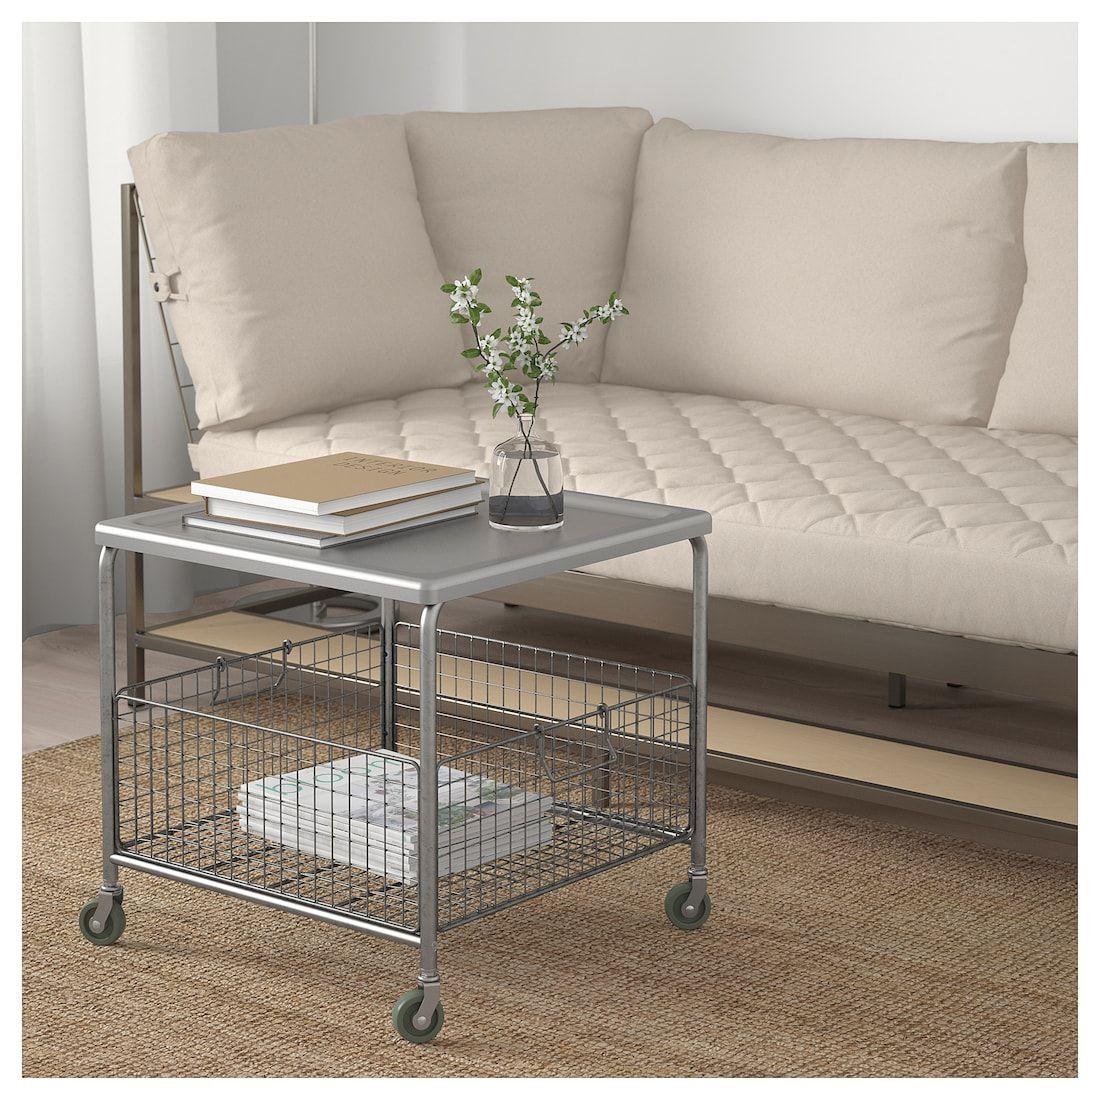 Home Furniture Store Modern Furnishings Decor At Home Furniture Store Furniture Coffee Table [ 1100 x 1100 Pixel ]